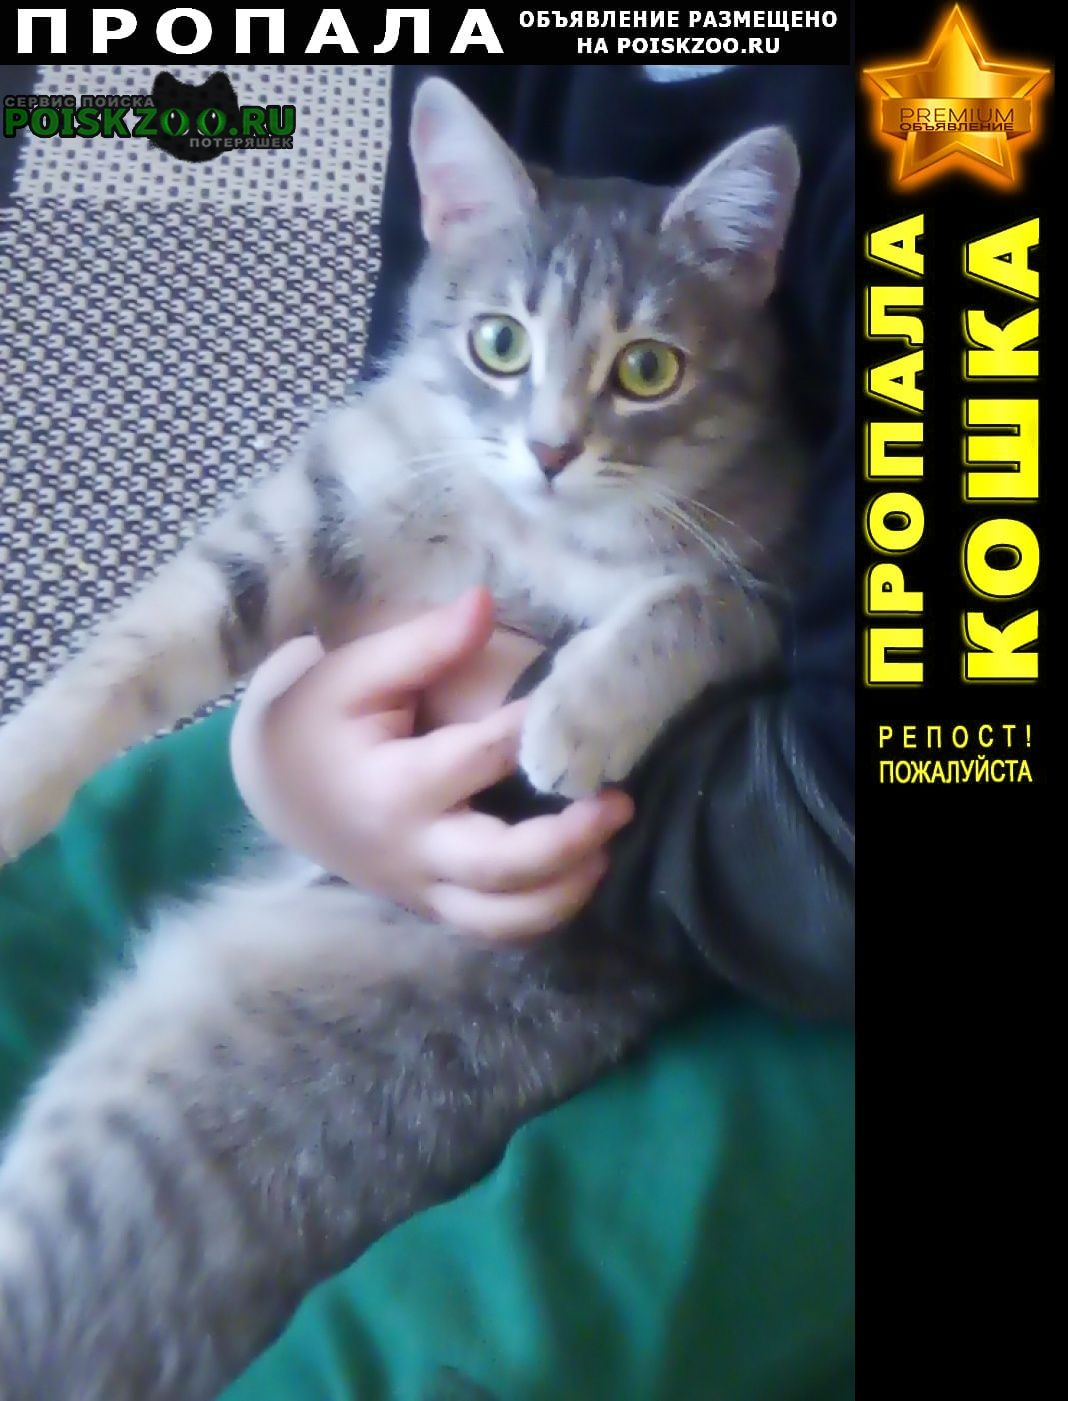 Пропала кошка Ижевск